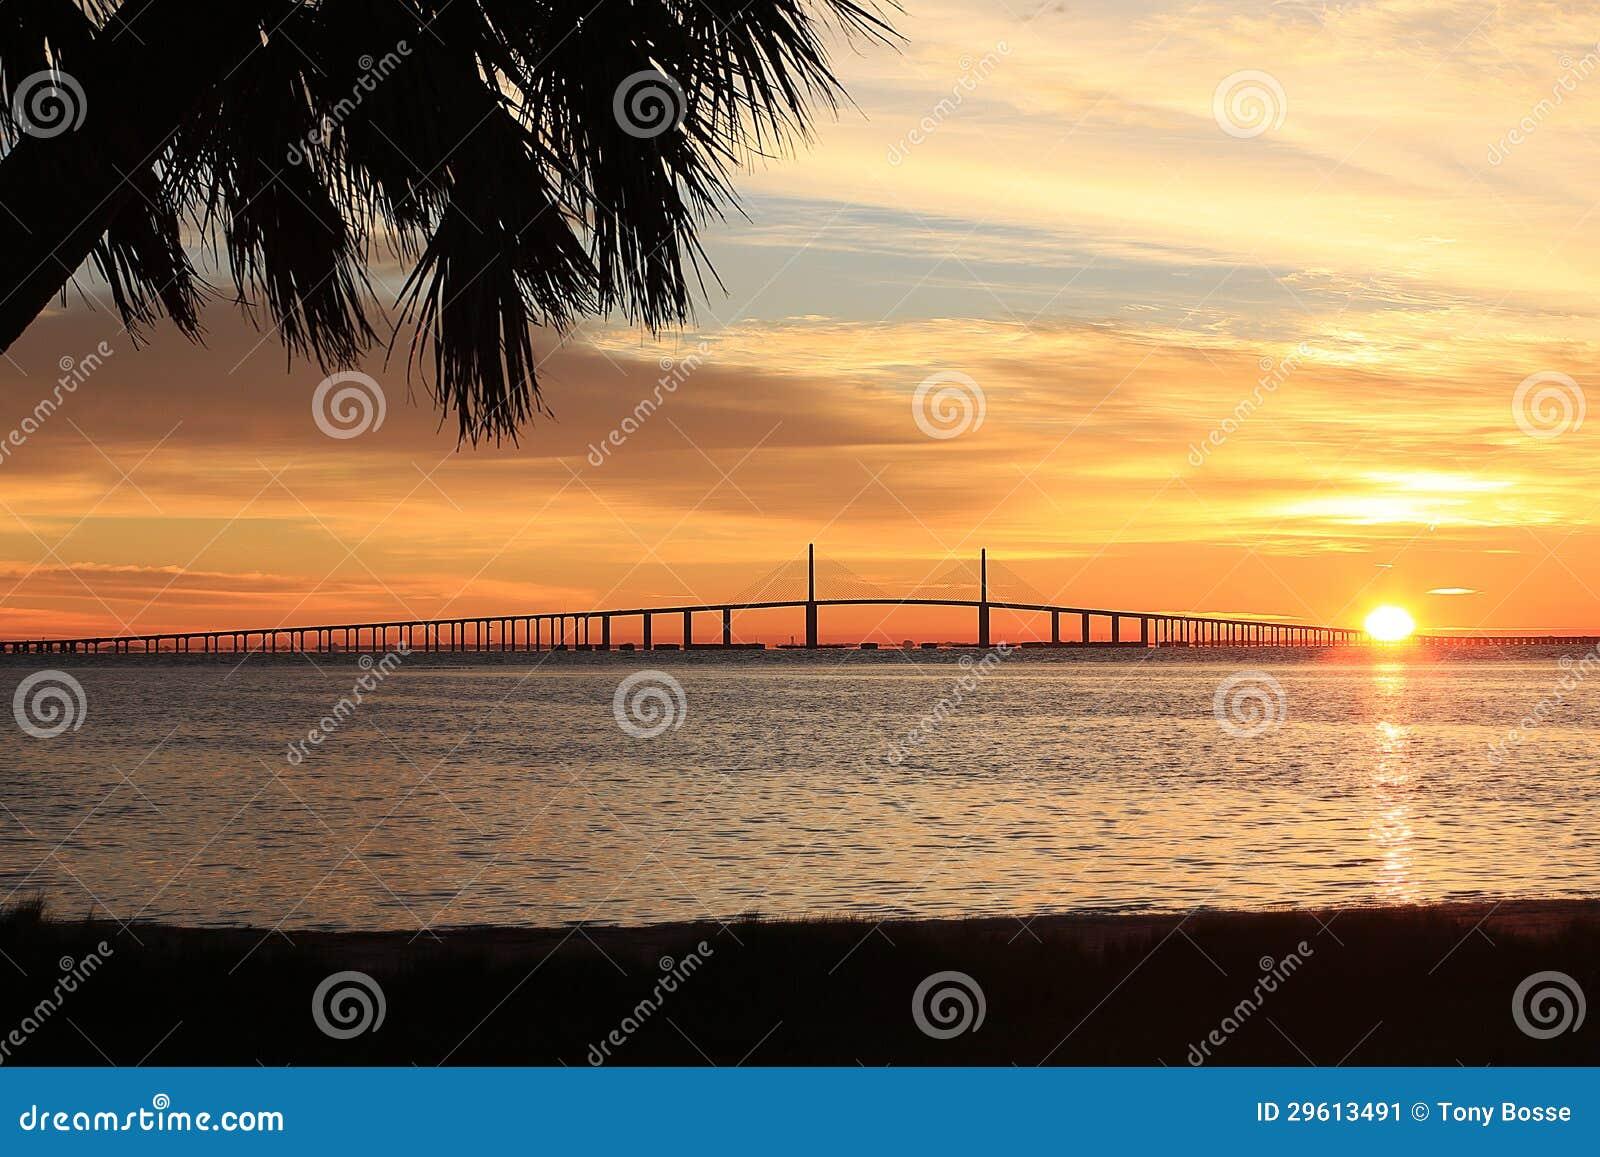 Sonnenschein Skyway Brücke am Sonnenaufgang